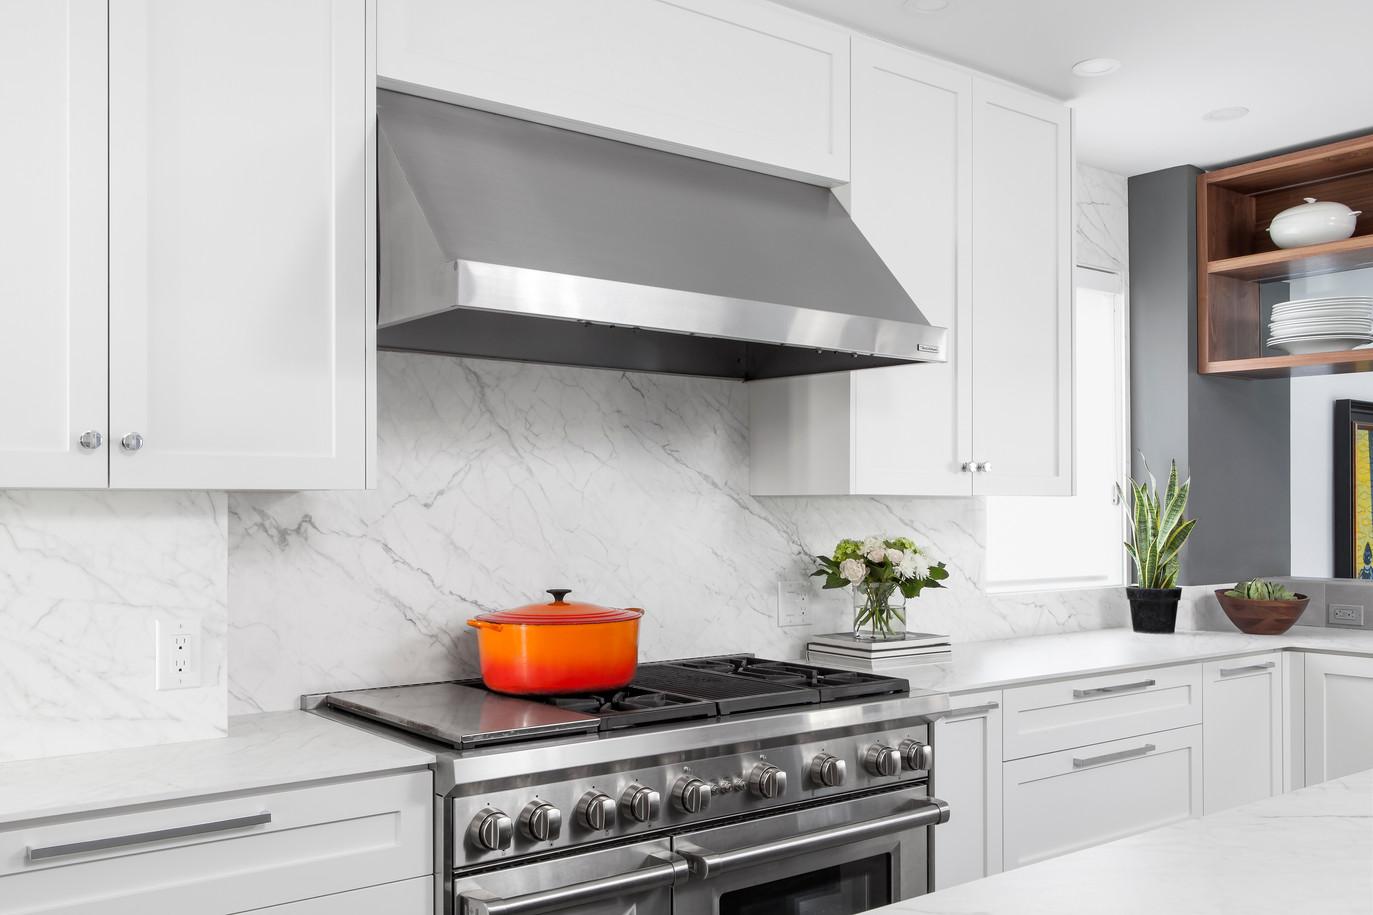 Lipson_kitchen angle.jpg